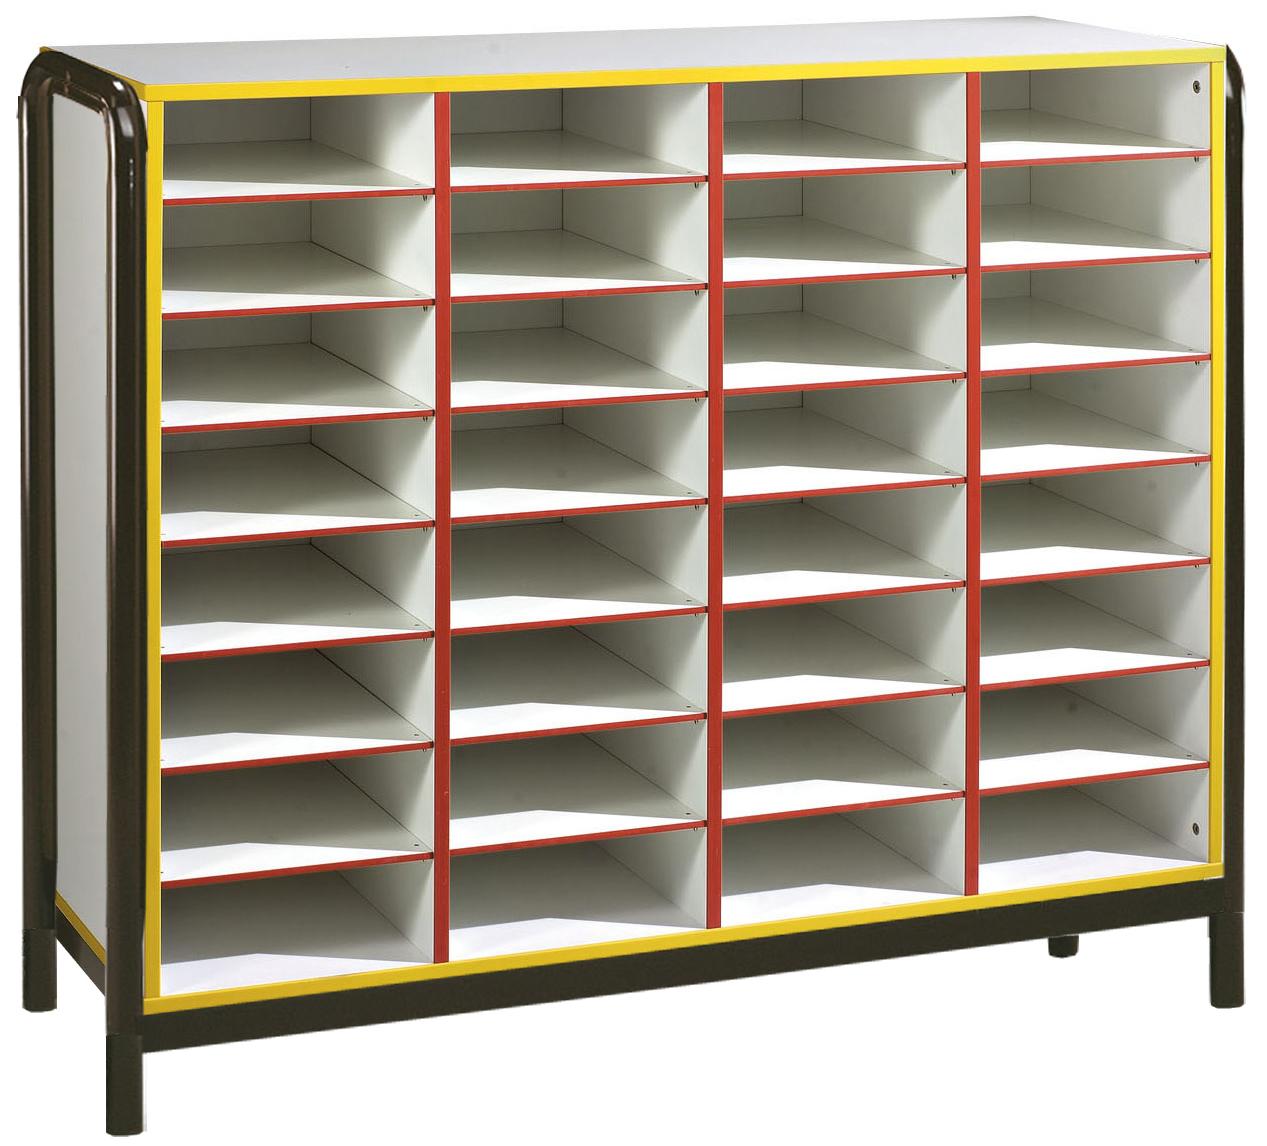 dpc maternelle meuble 32 cases pi tement lat ral m tal. Black Bedroom Furniture Sets. Home Design Ideas